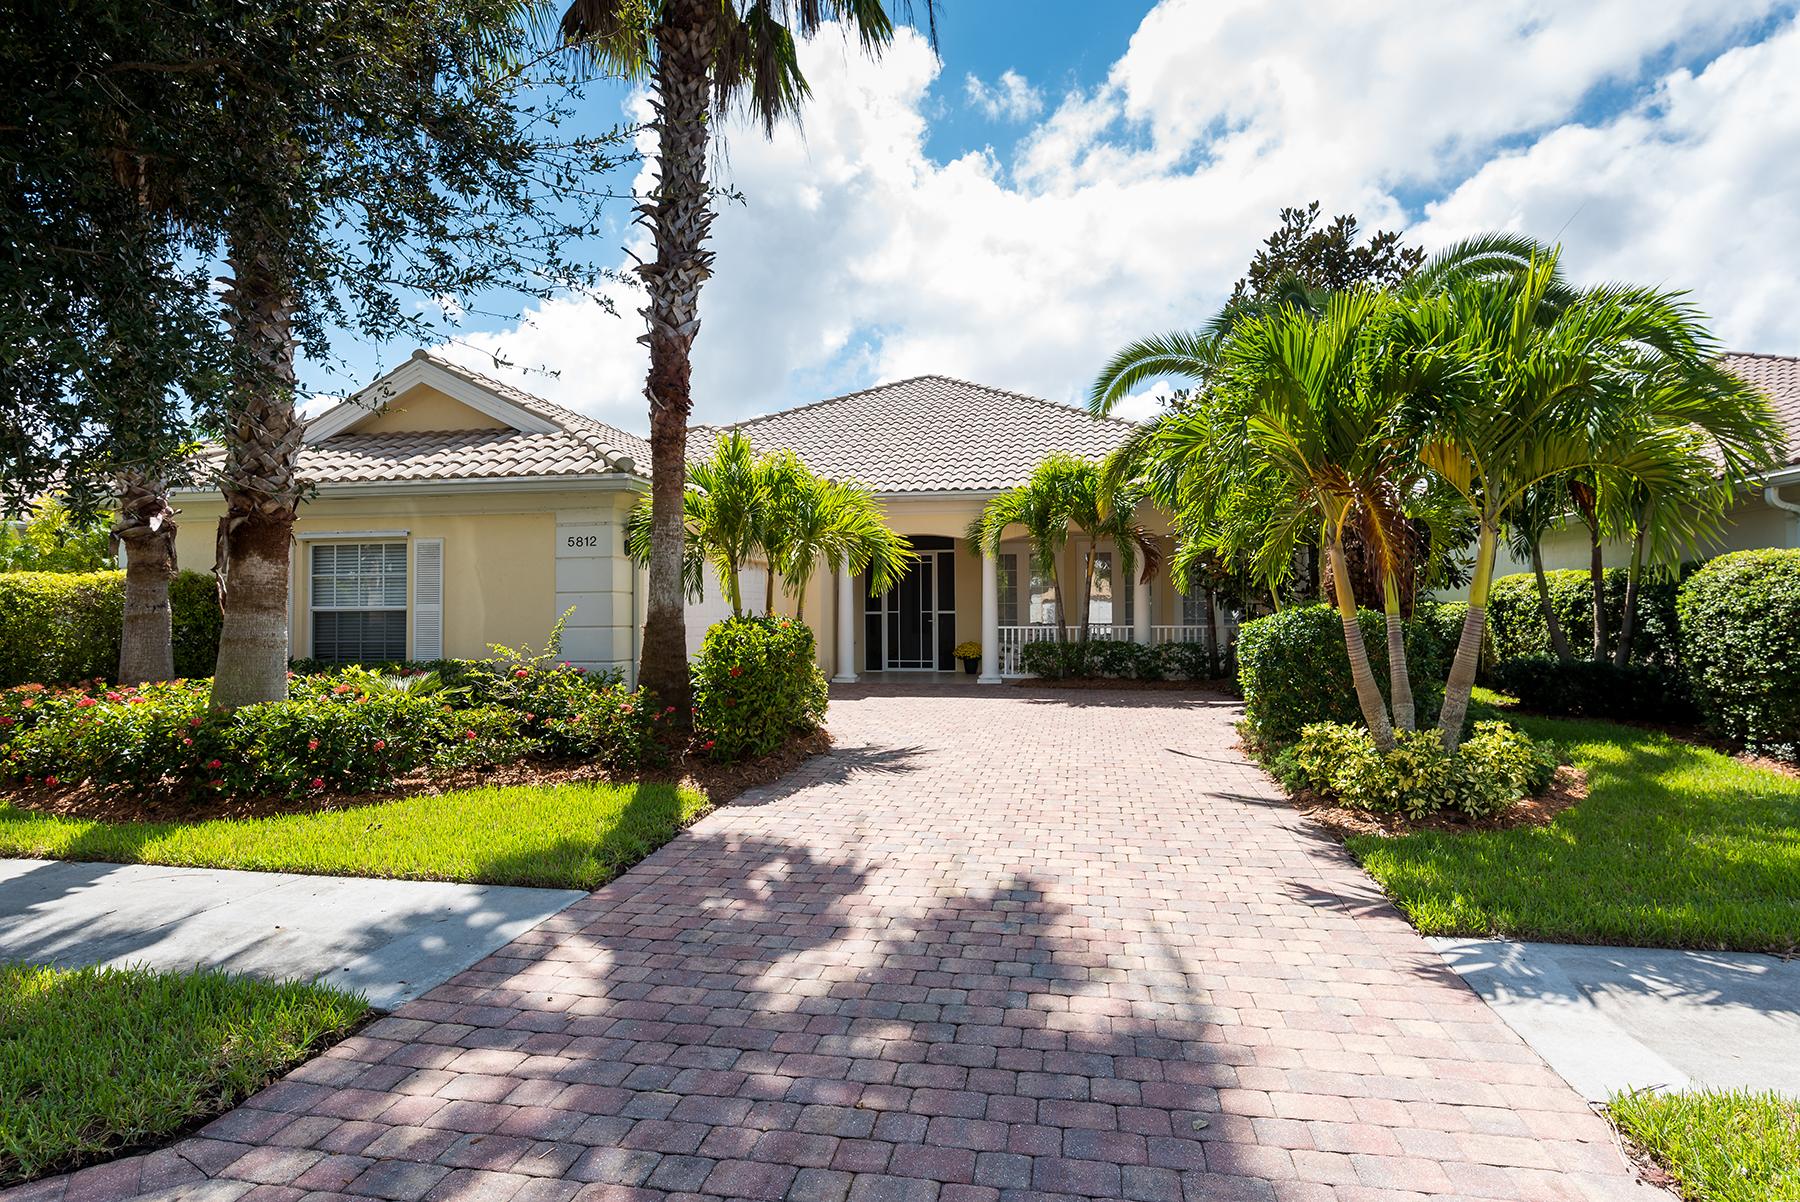 Single Family Home for Sale at VILLAGE WALK 5812 Valente Pl, Sarasota, Florida 34238 United States